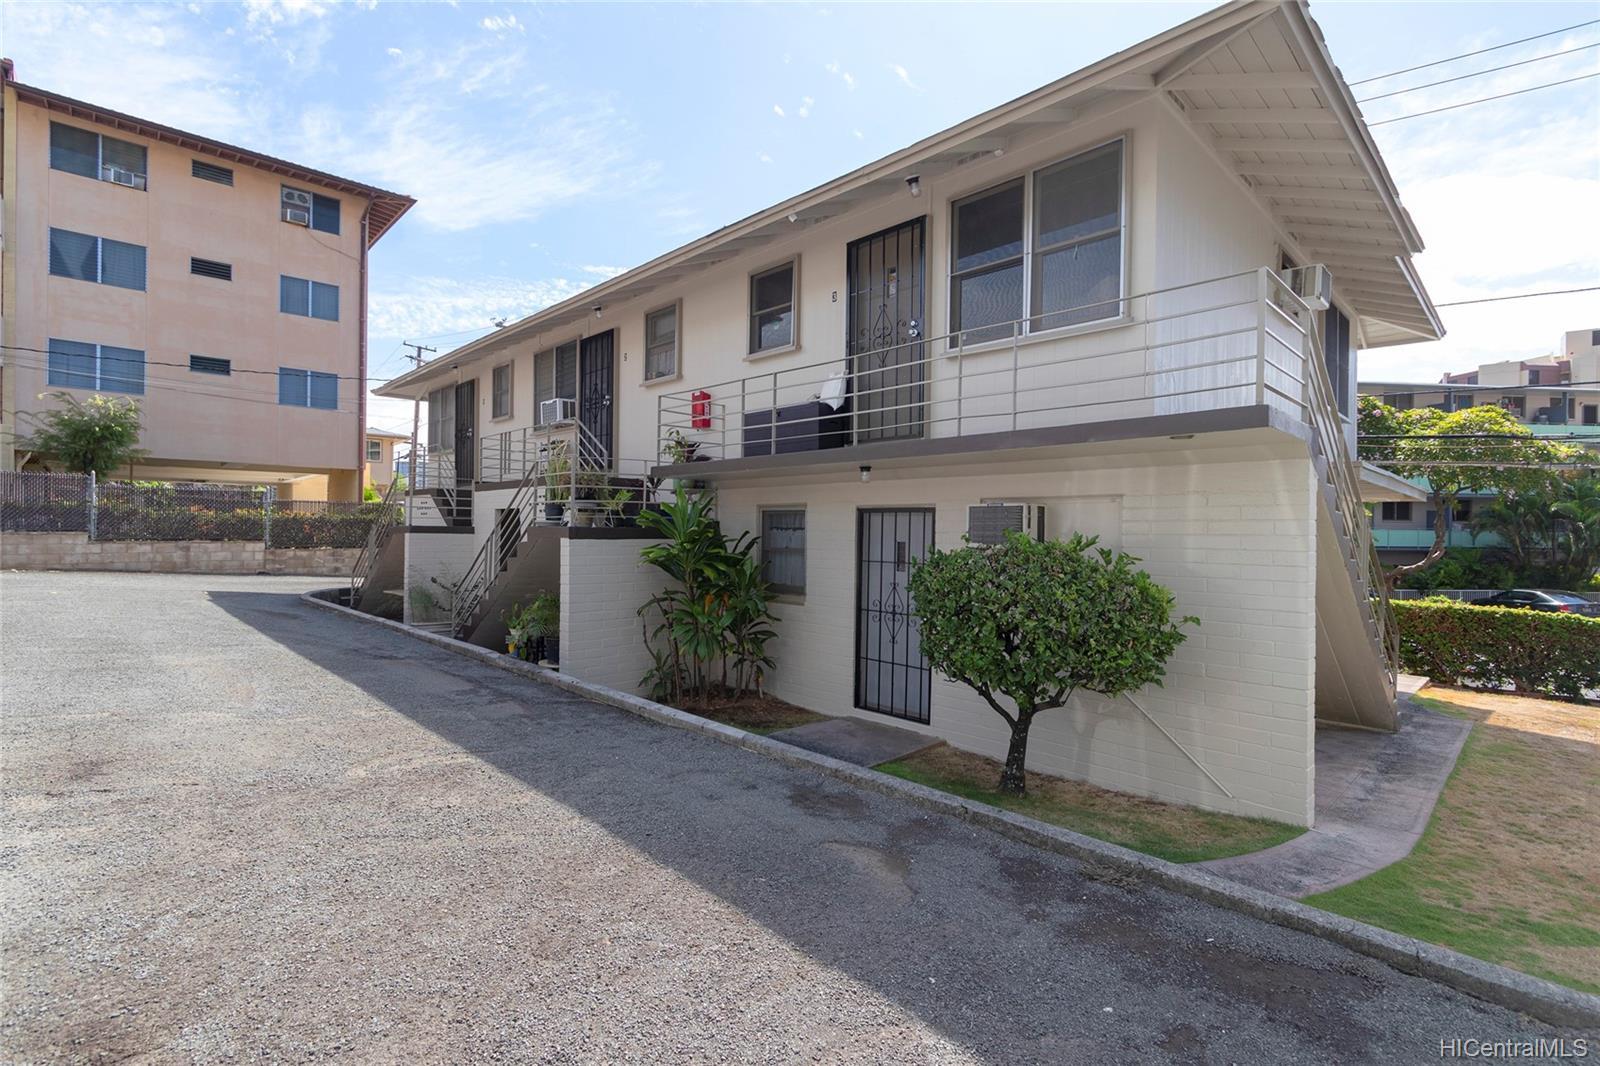 1464 Thurston Ave Honolulu - Multi-family - photo 5 of 25